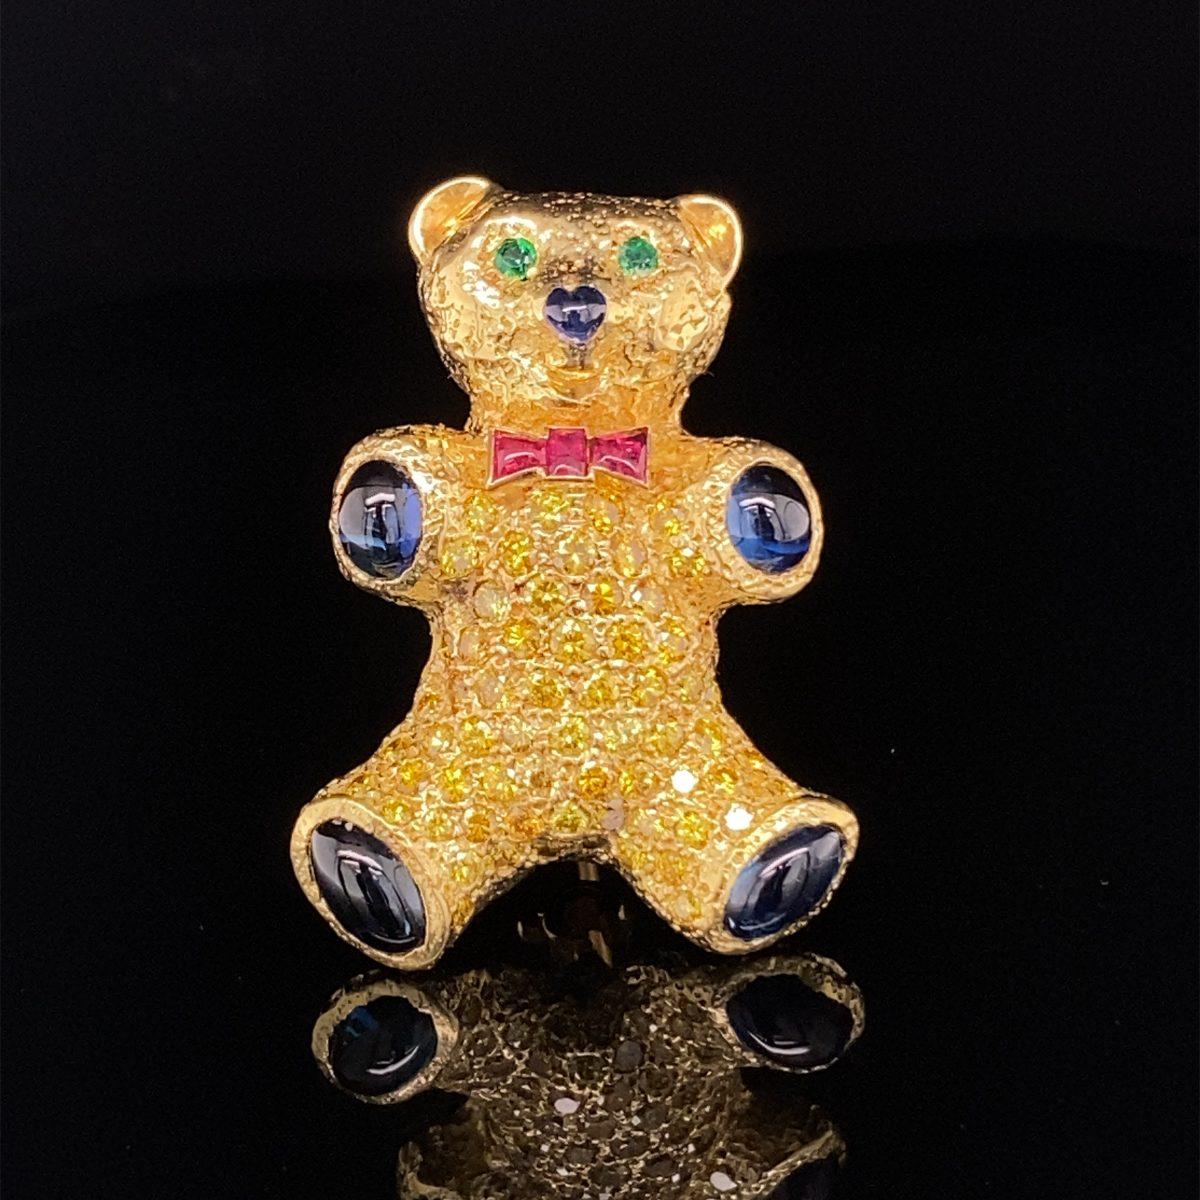 Yellow diamond, 'Teddy Bear' brooch